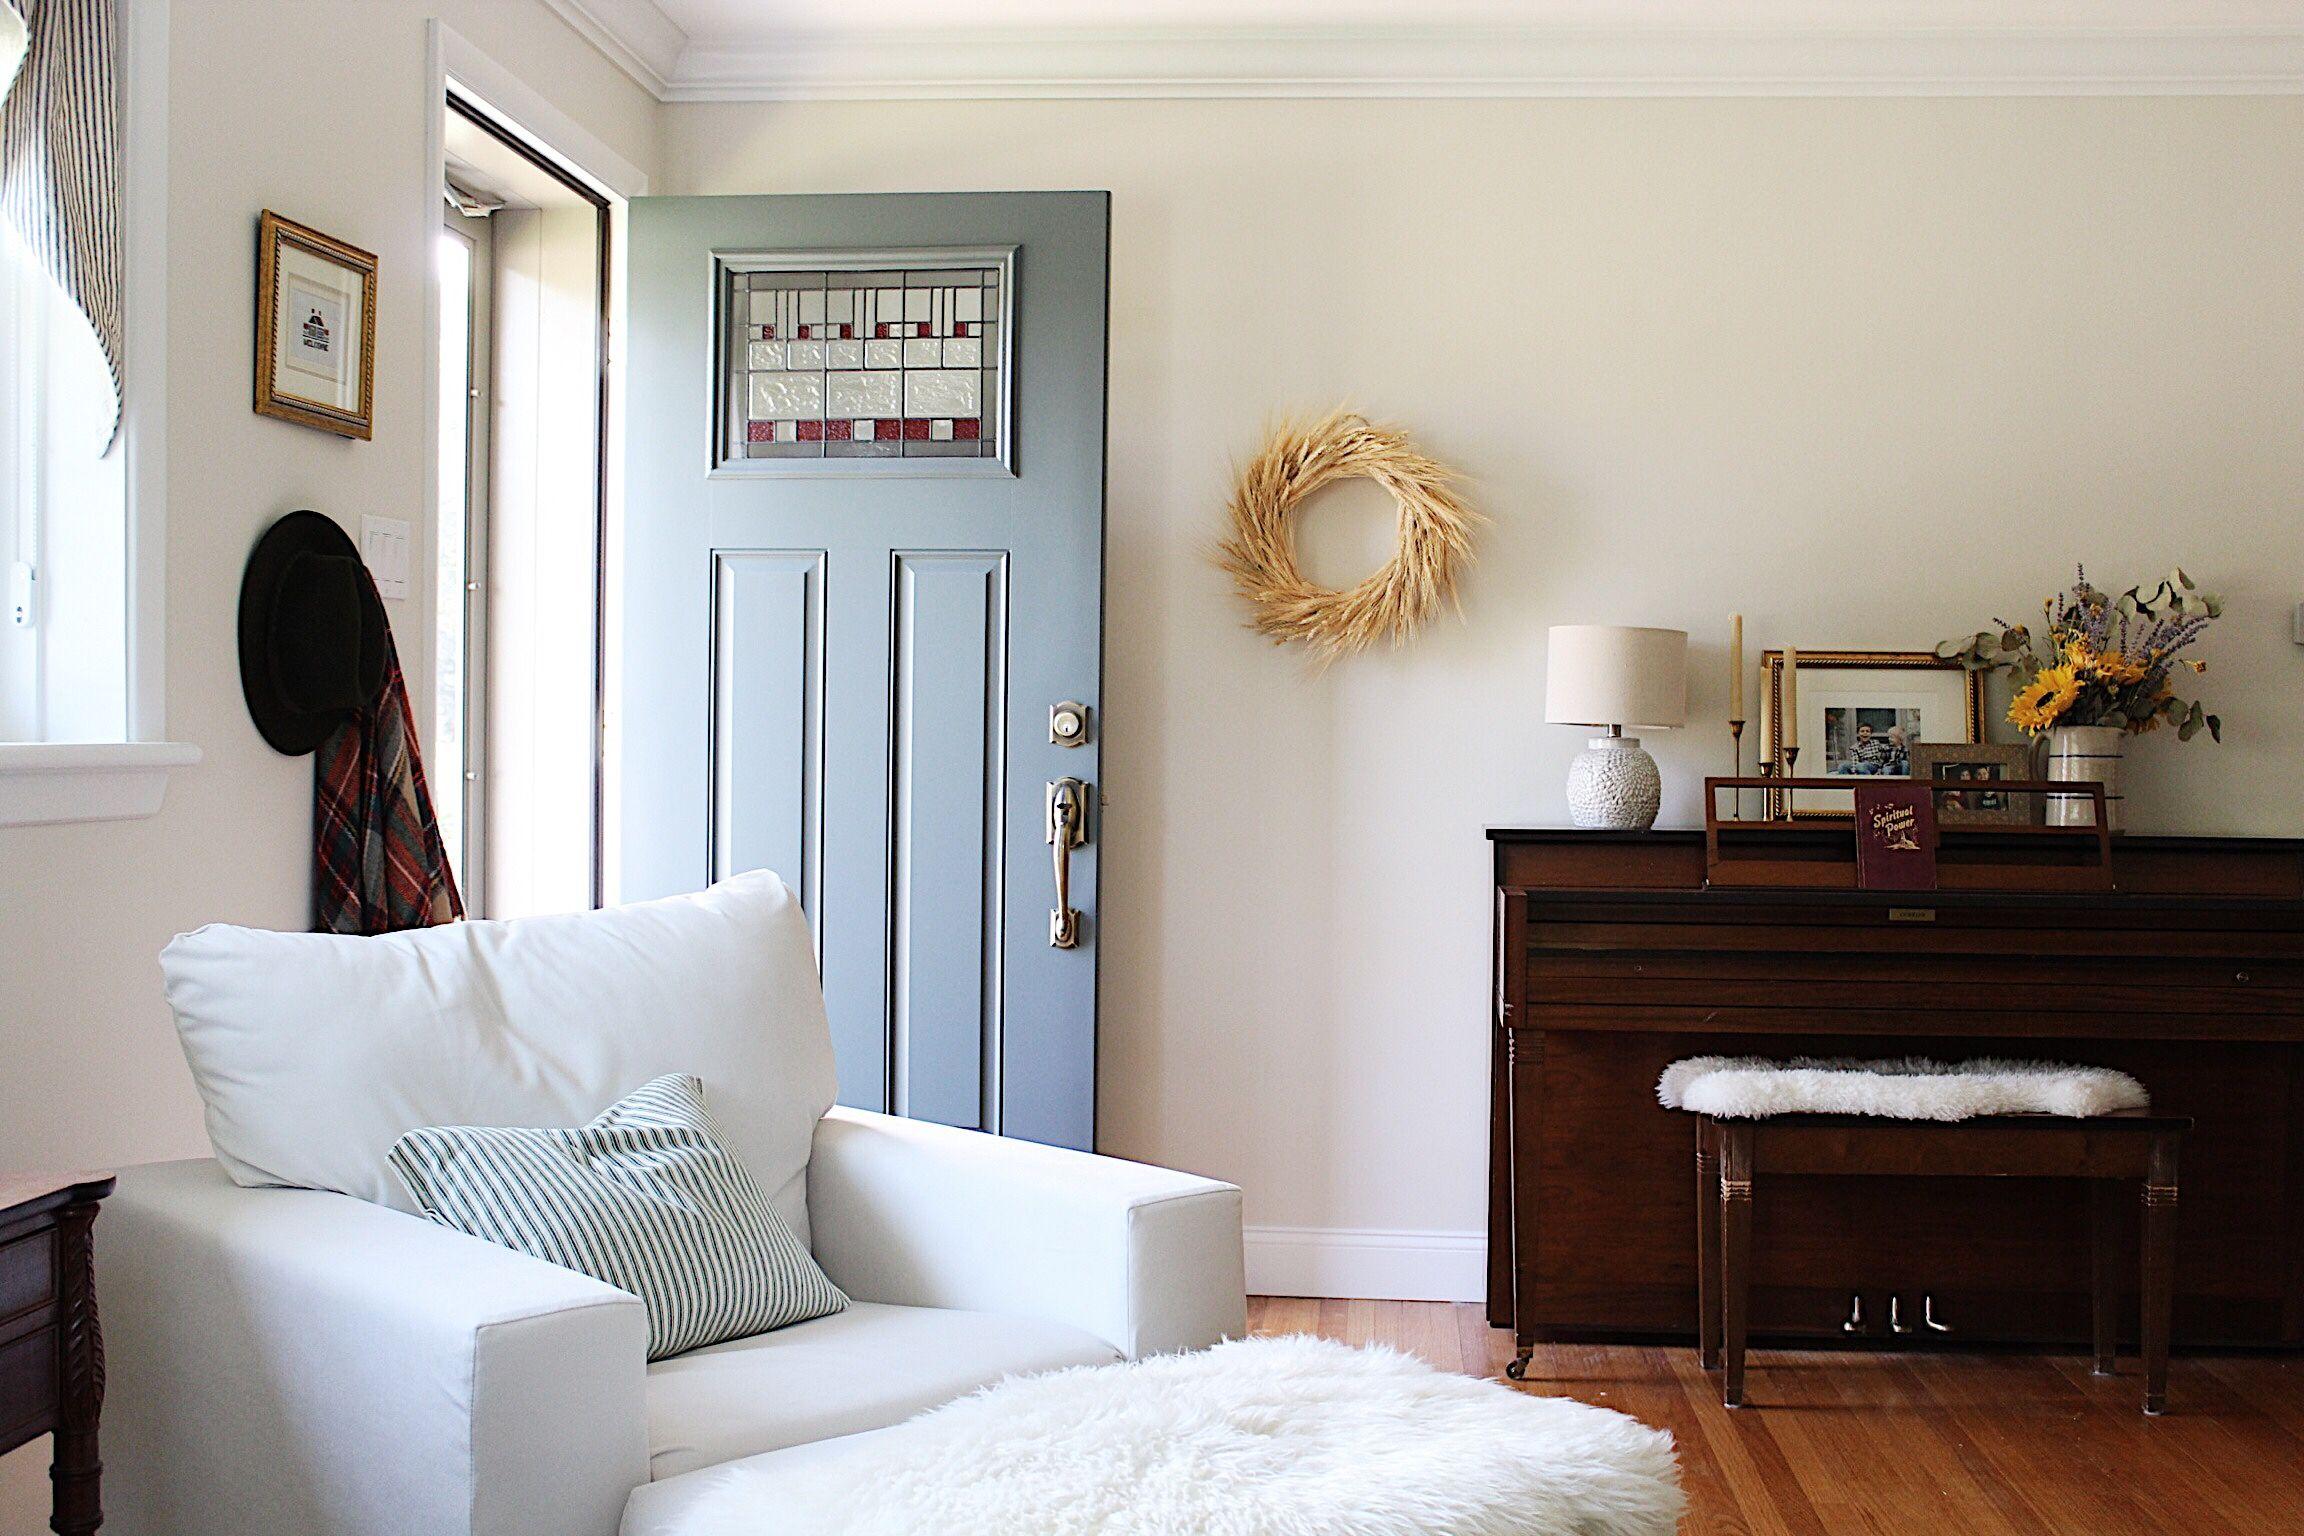 Home Reserve Chair - Modular Furniture in 2020   Modular ...